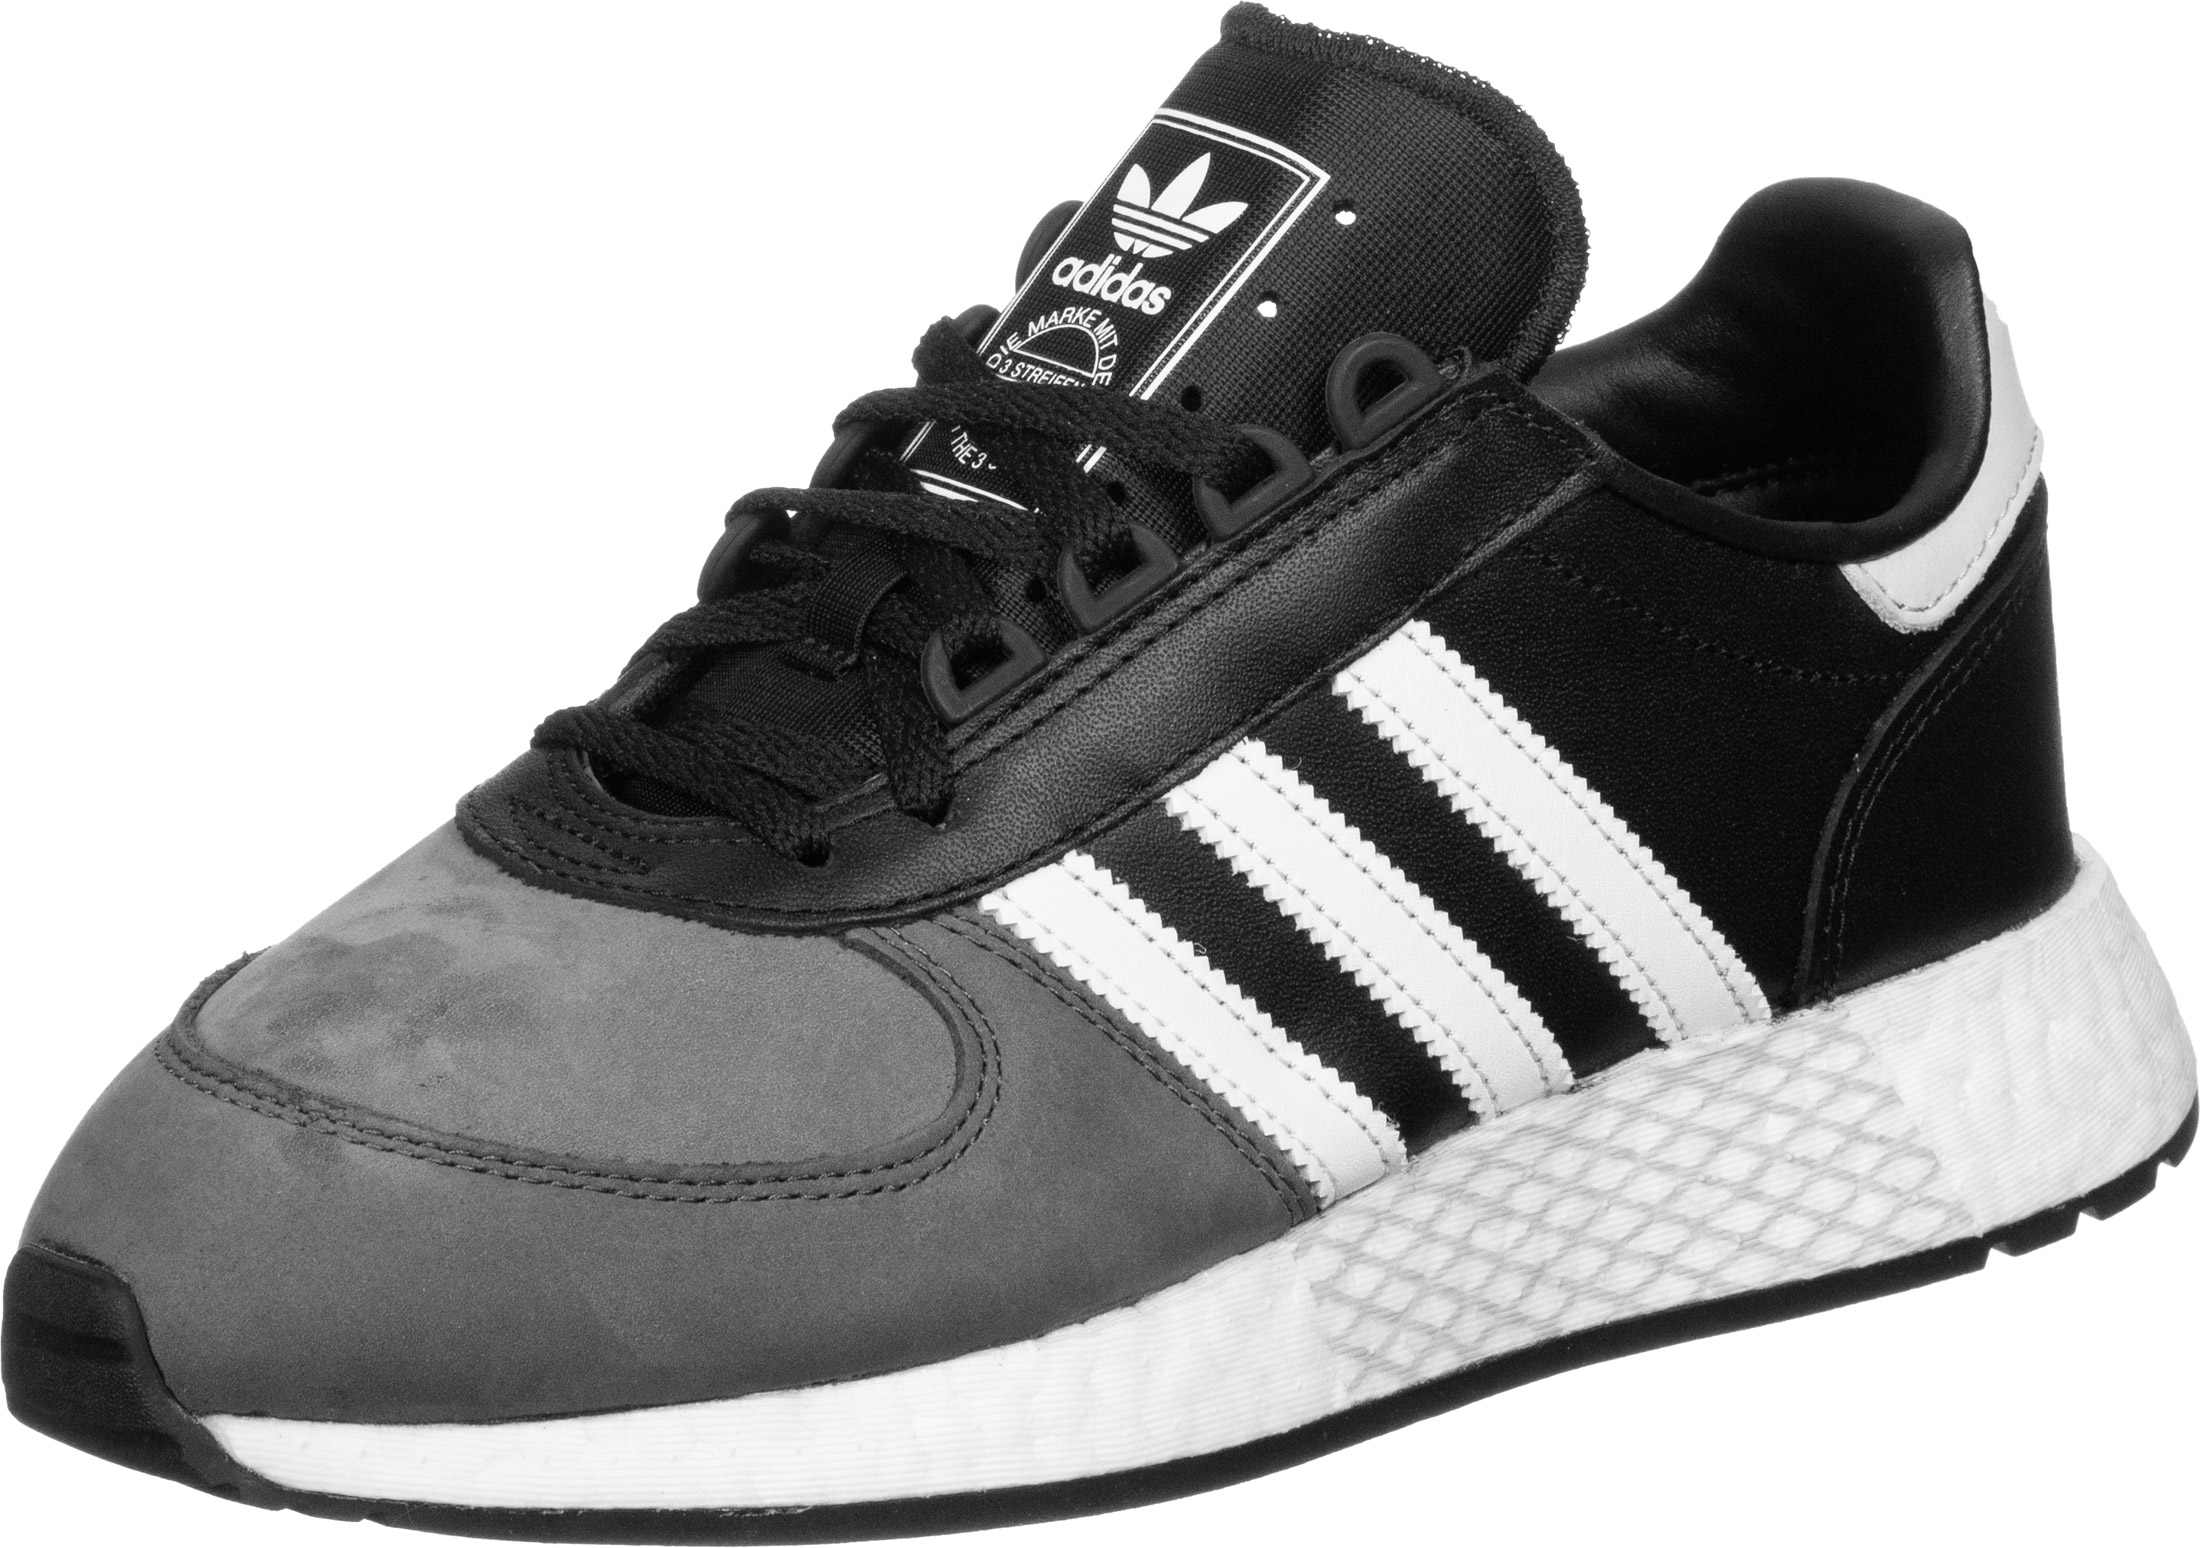 adidas Marathon Tech - Sneakers Low at